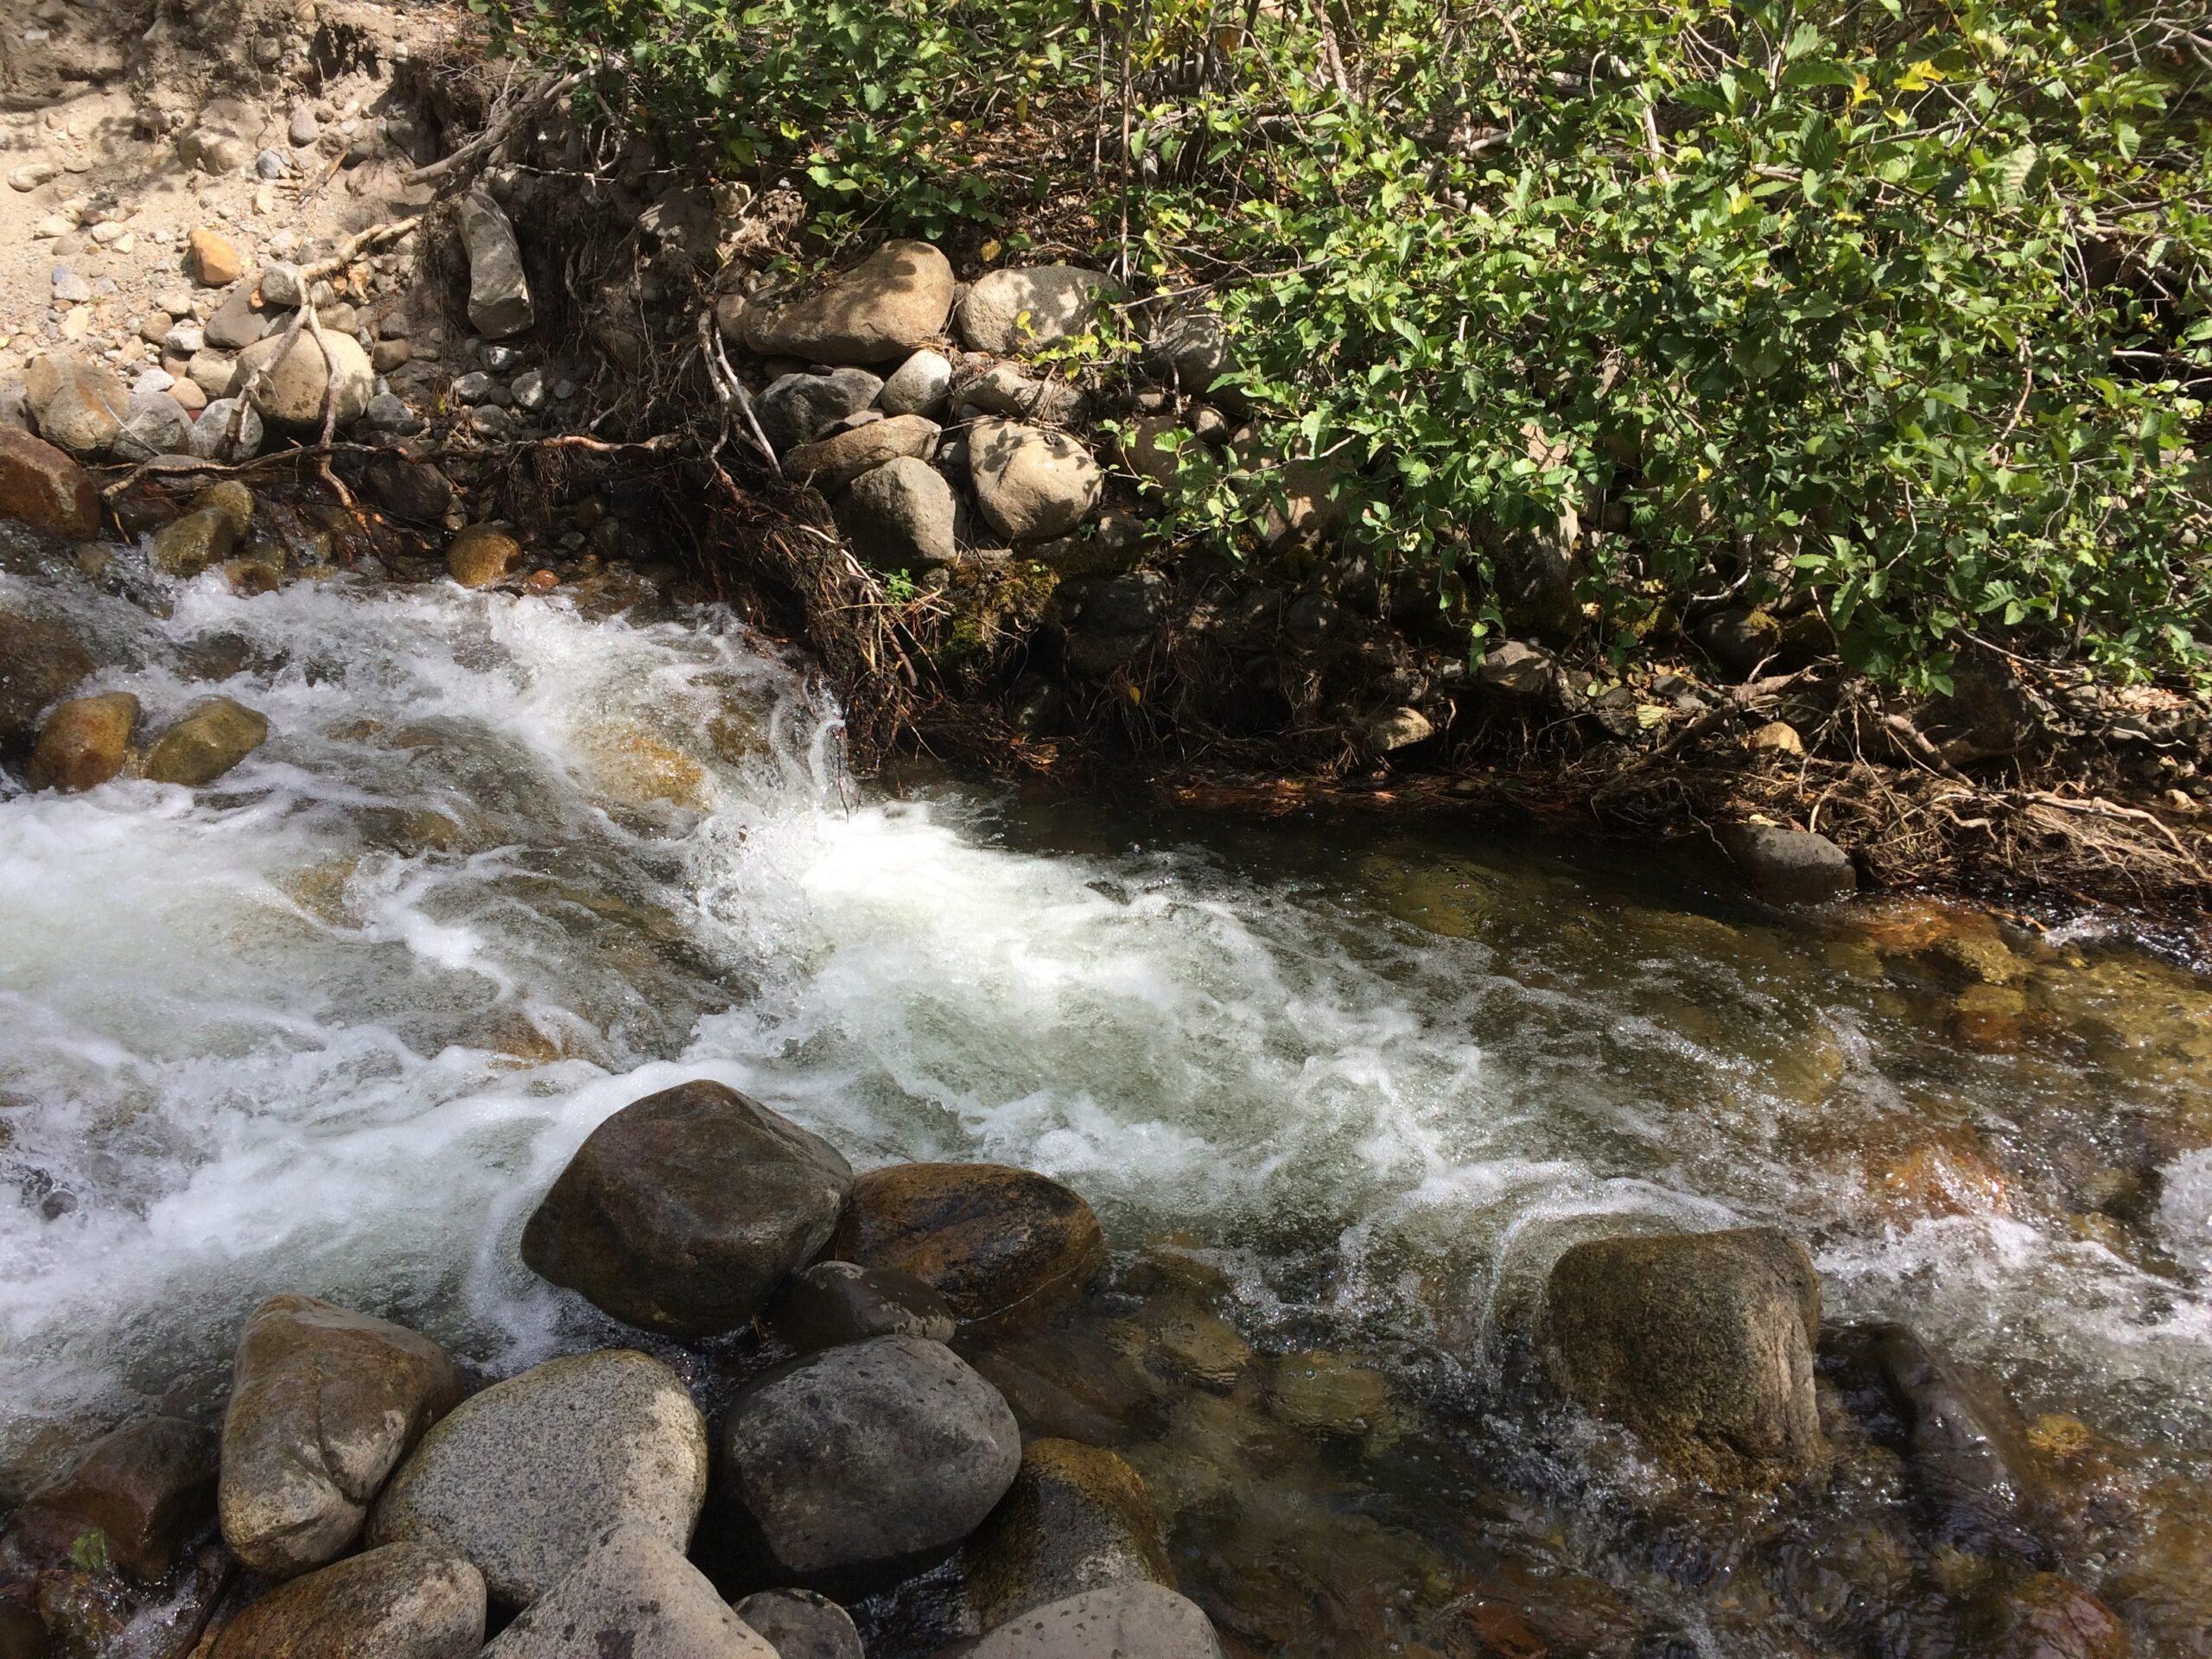 image of a stream